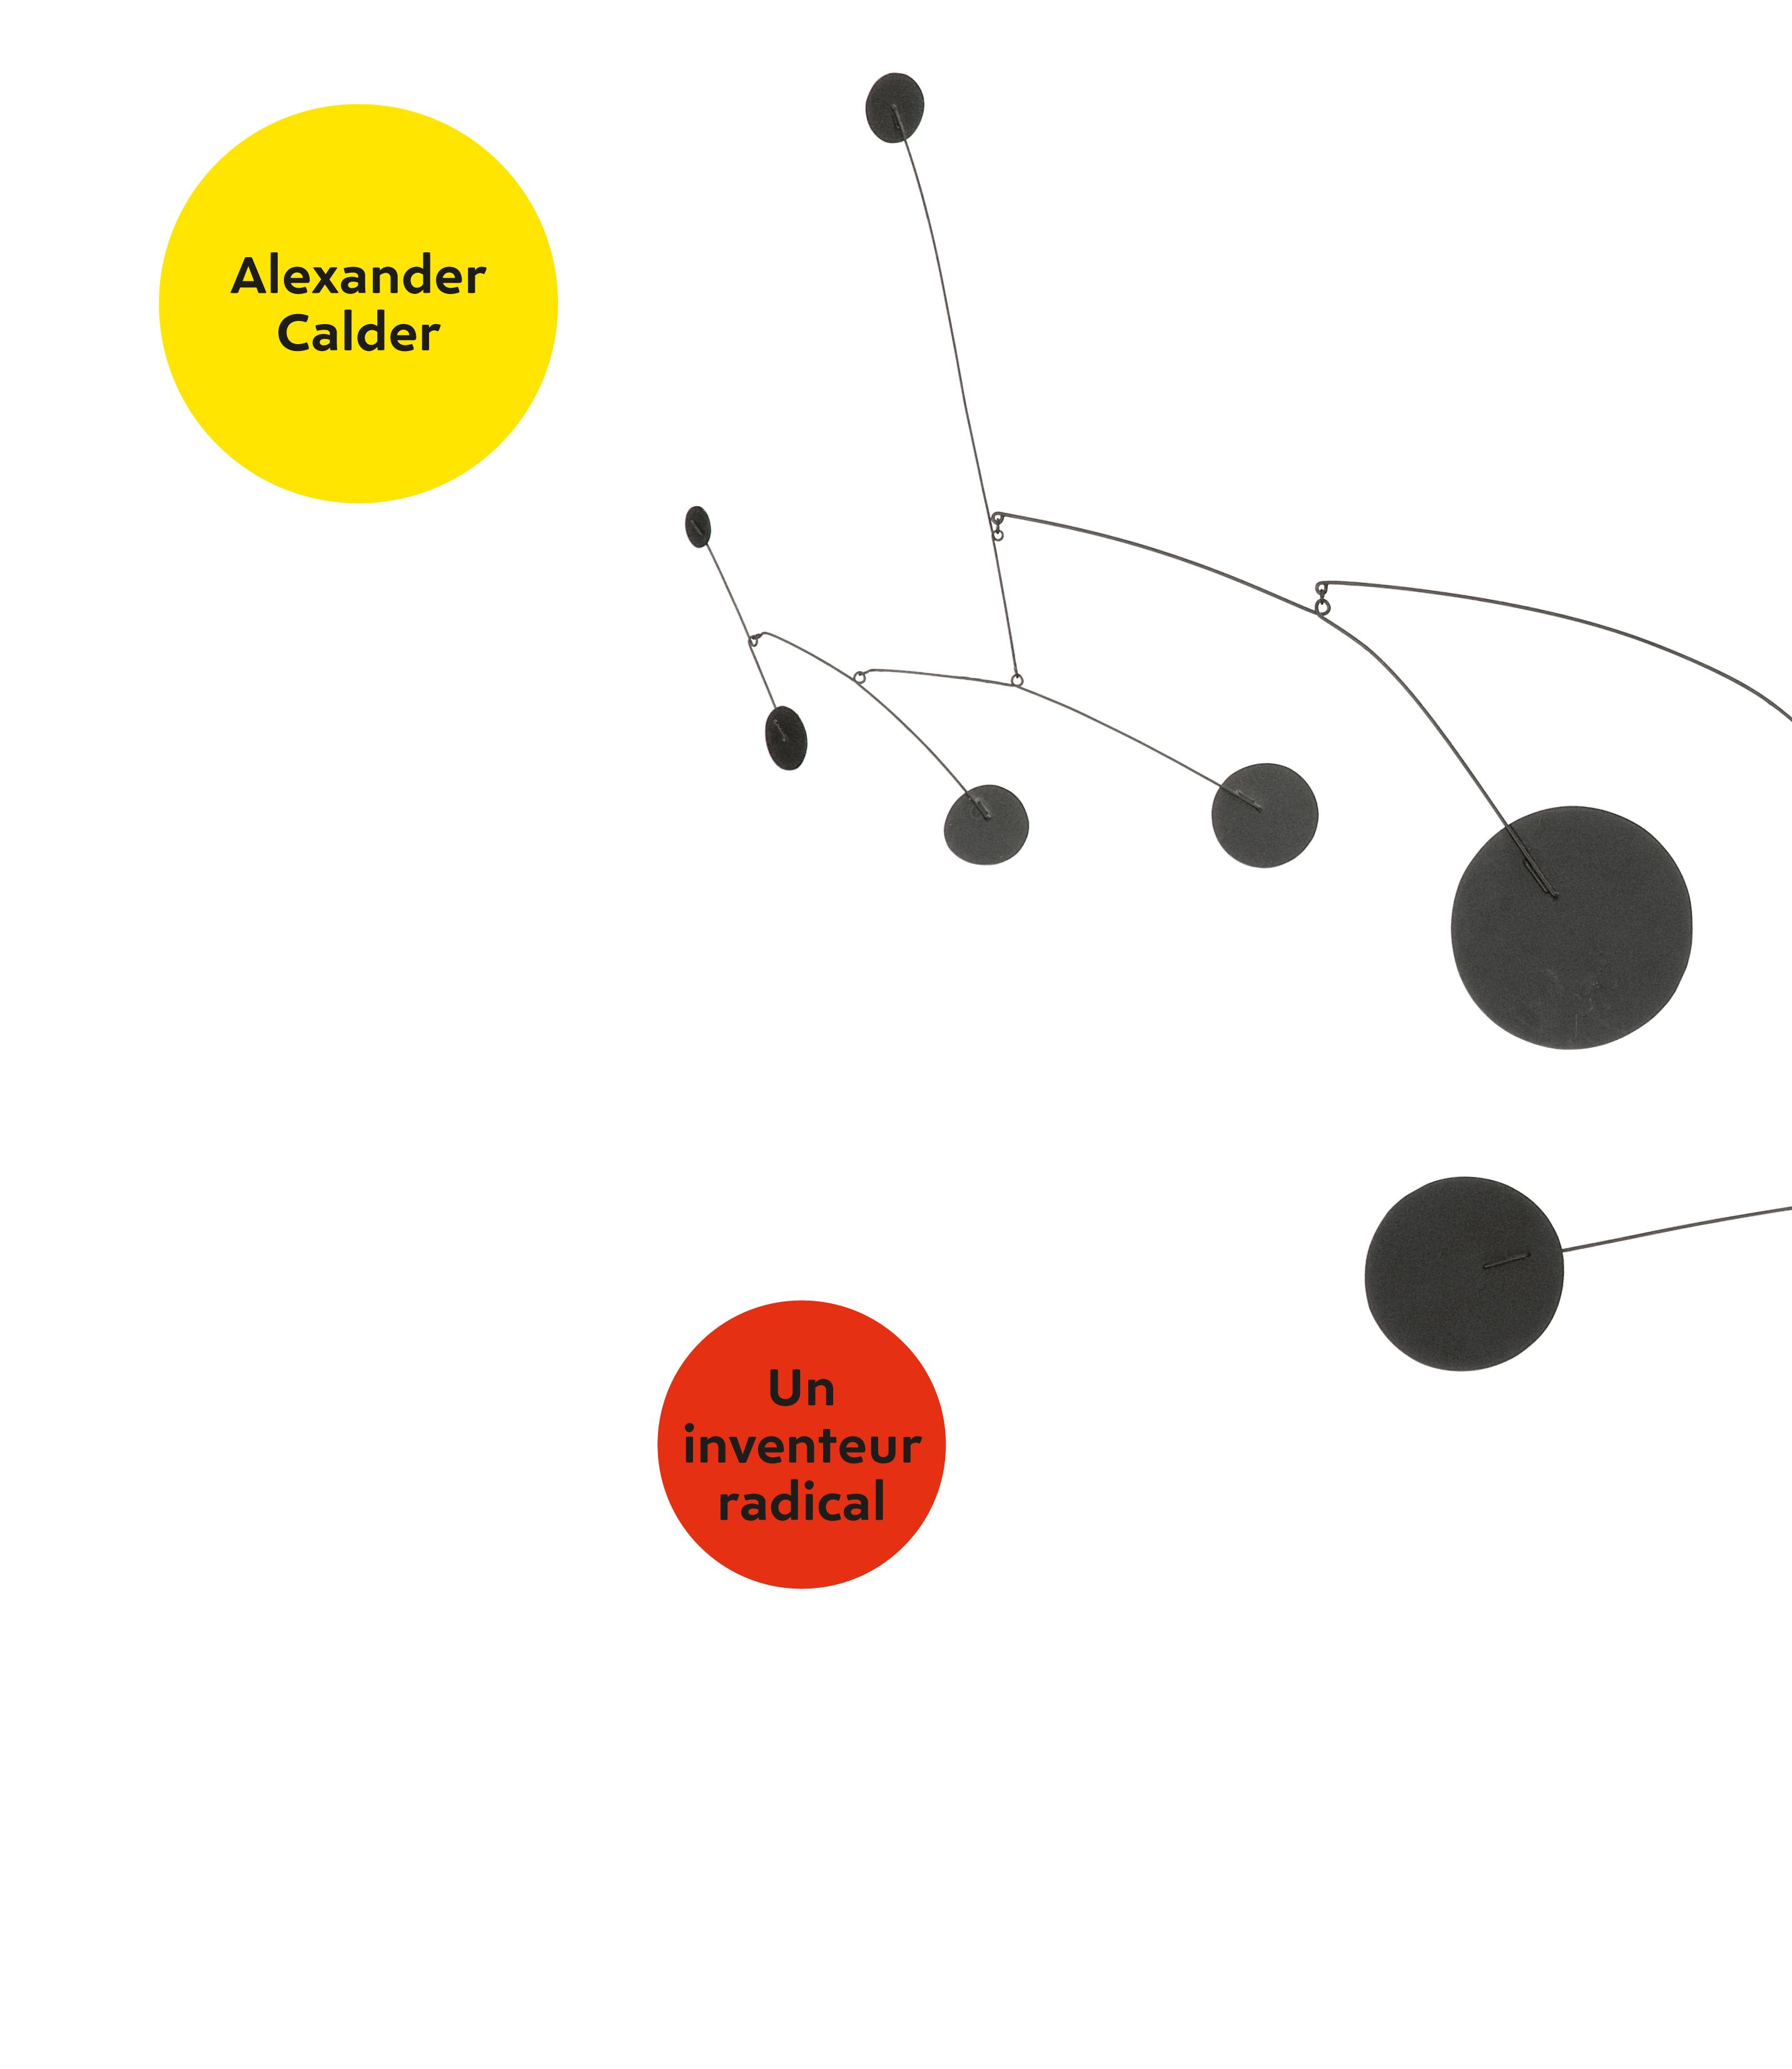 ALEXANDER CALDER - UN INVENTEUR RADICAL